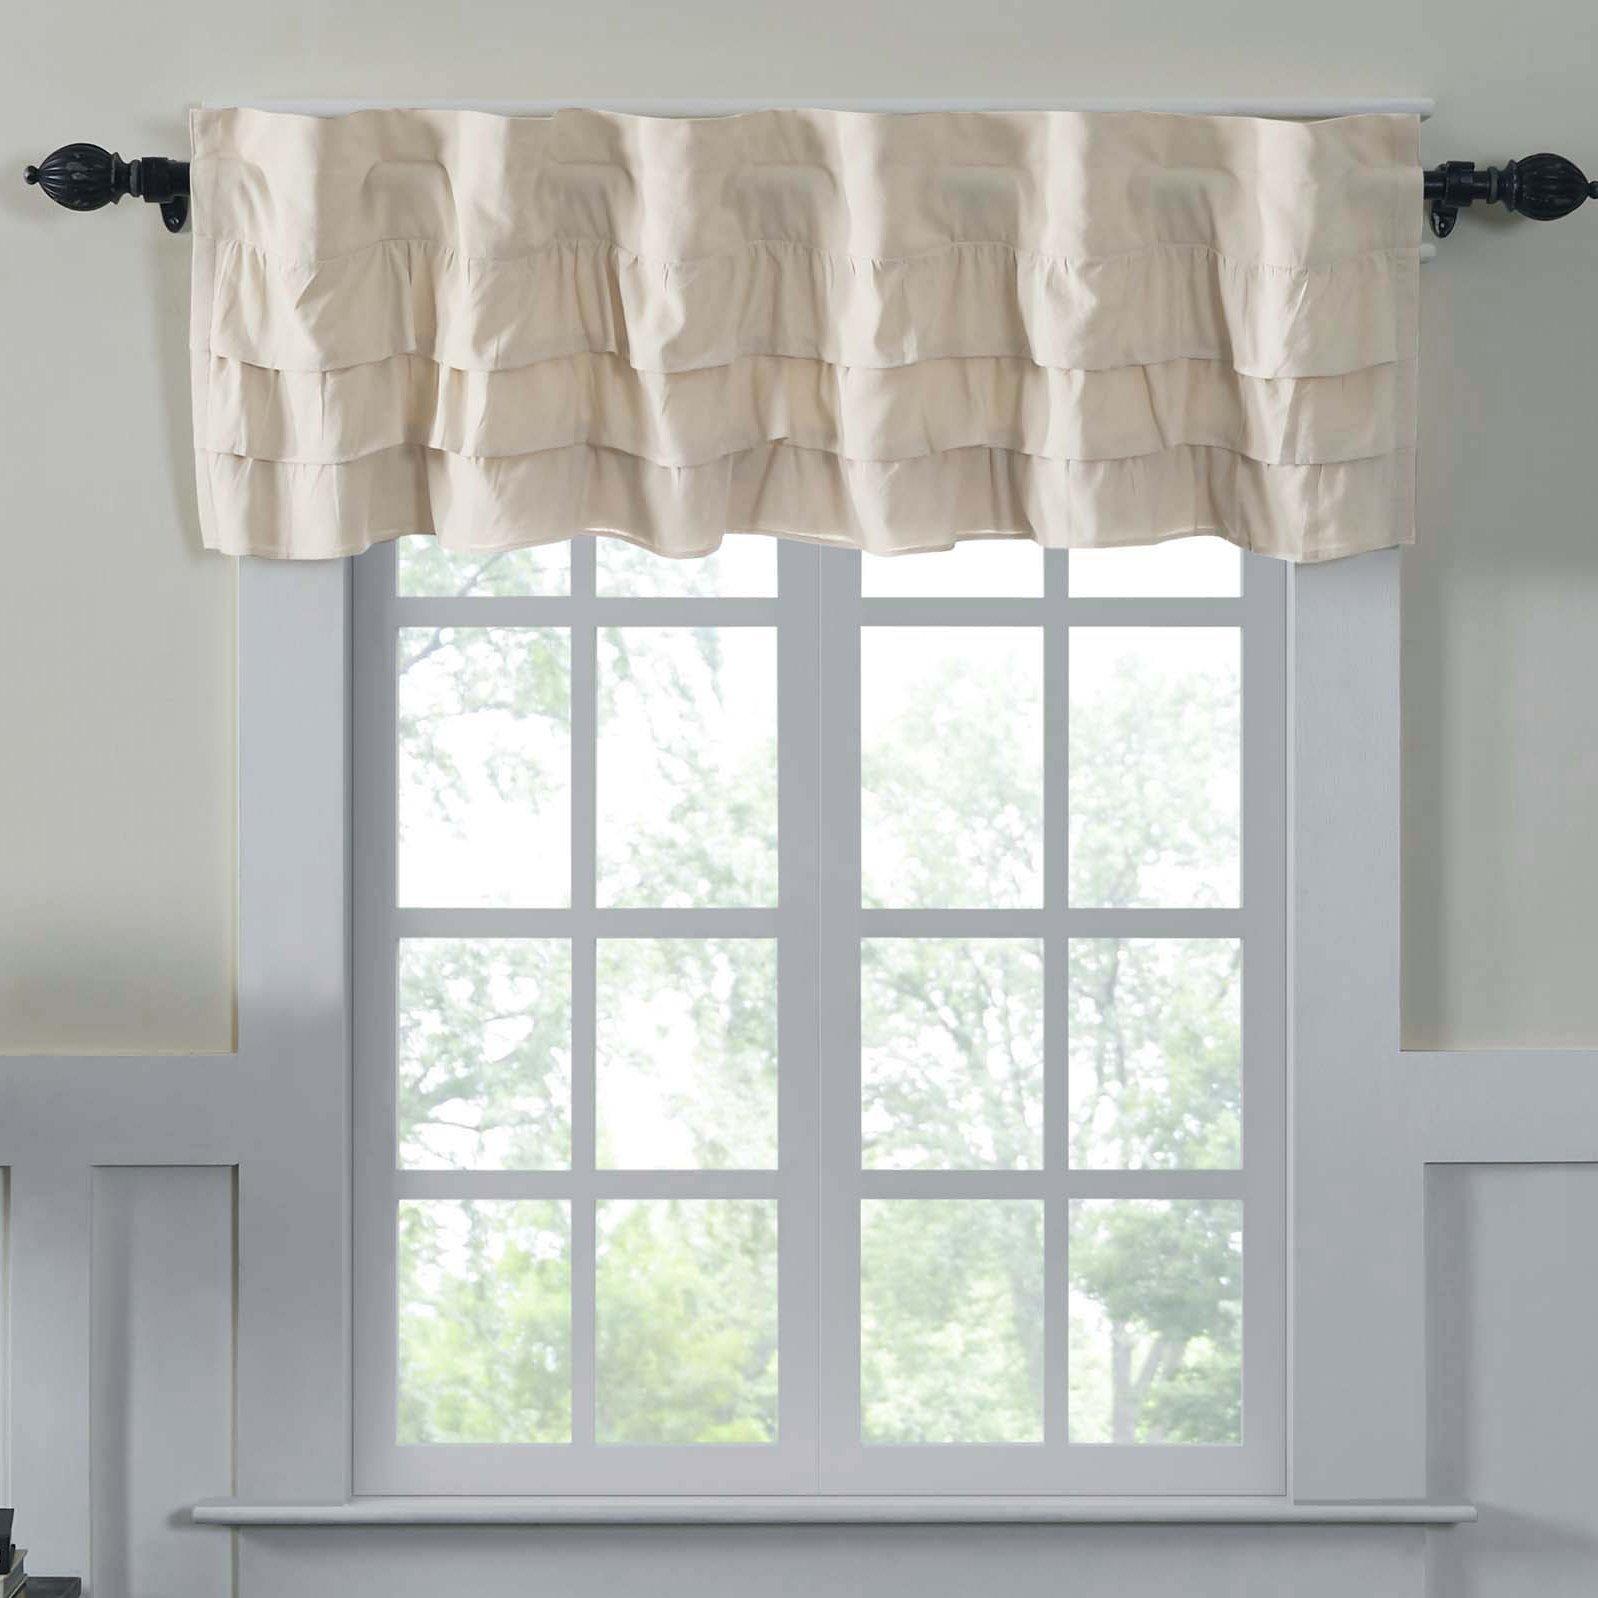 Piper Classics Ruffled Chambray Natural Lined Valance, 16x60, Farmhouse Decor Curtain by Piper Classics